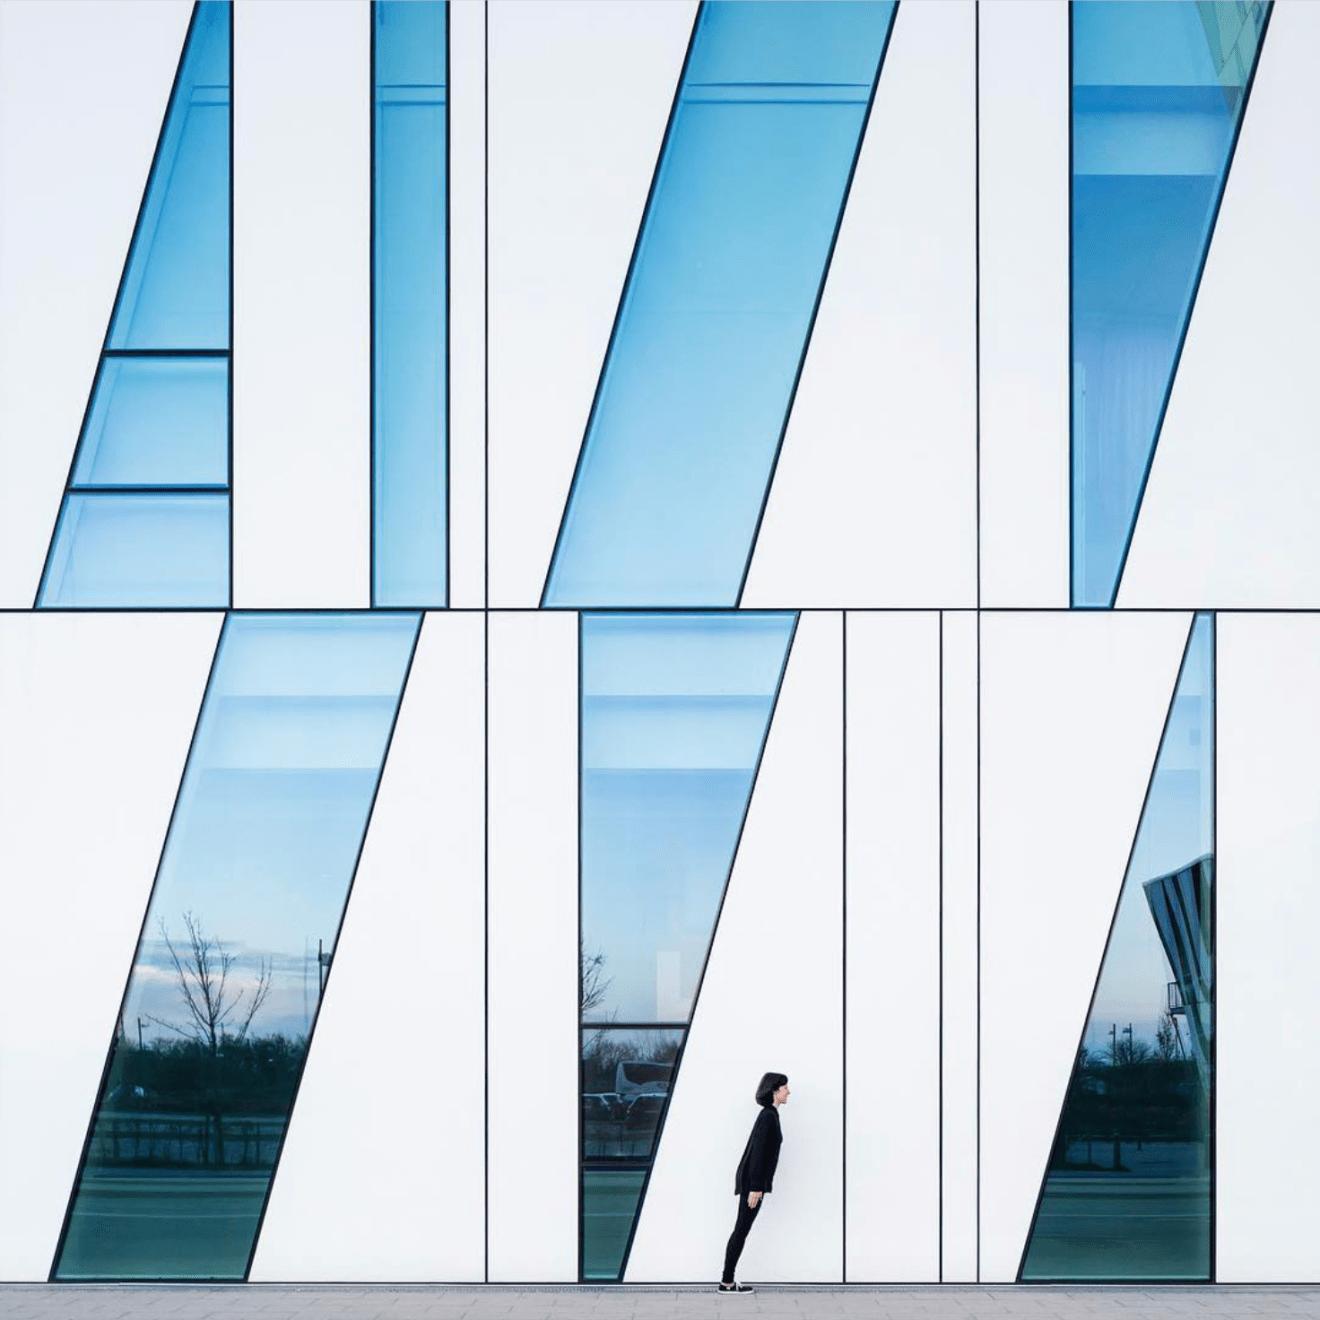 архитектурная фотография фото